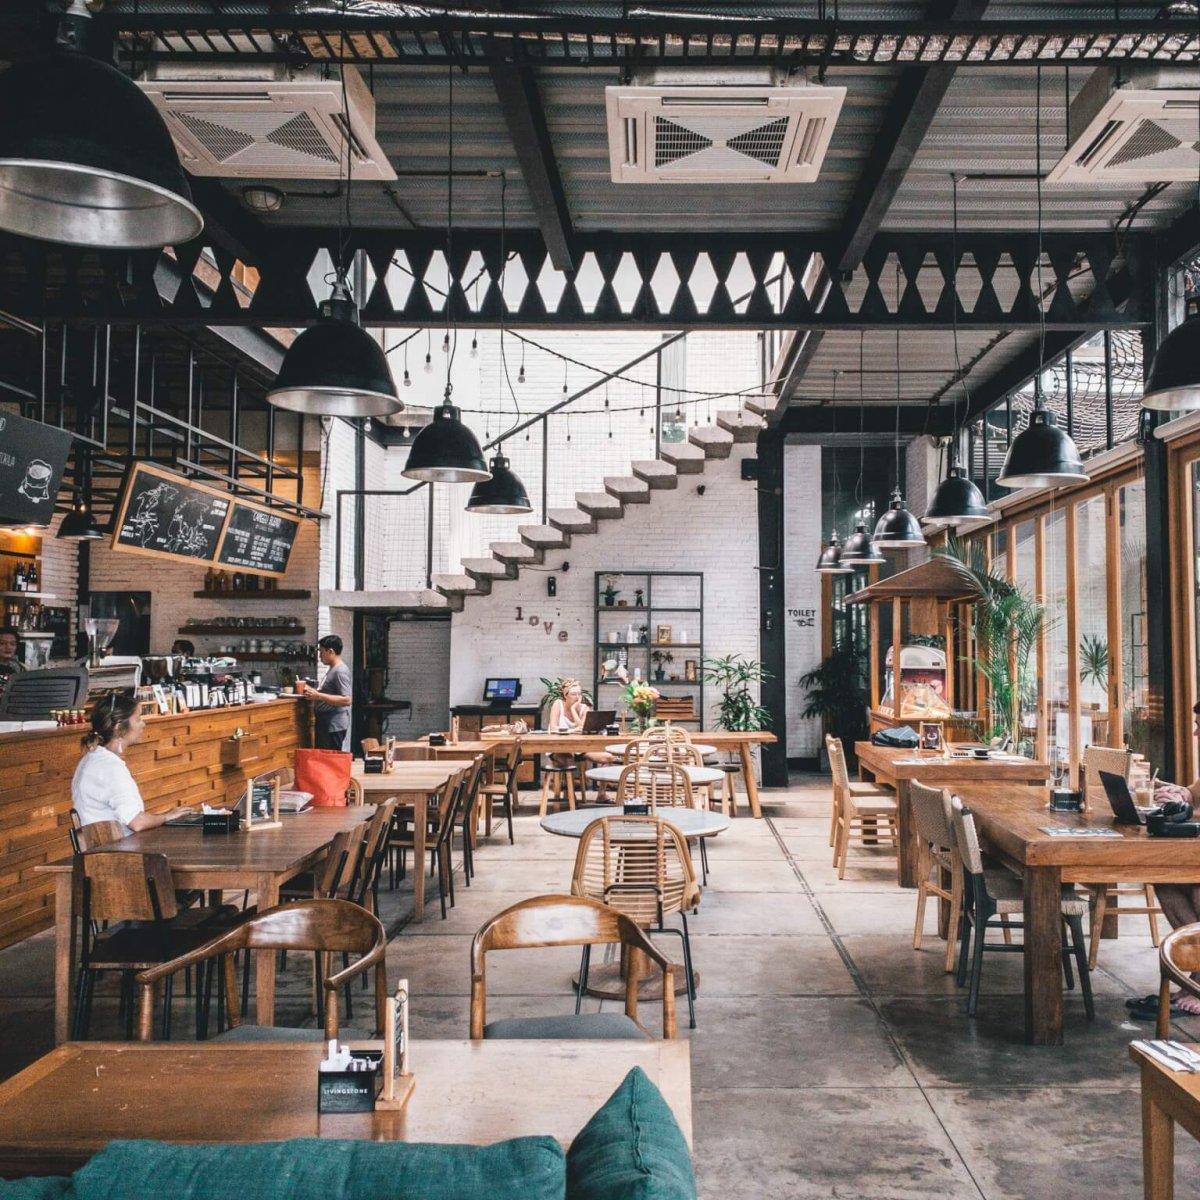 space 18 - National Restaurant Properties